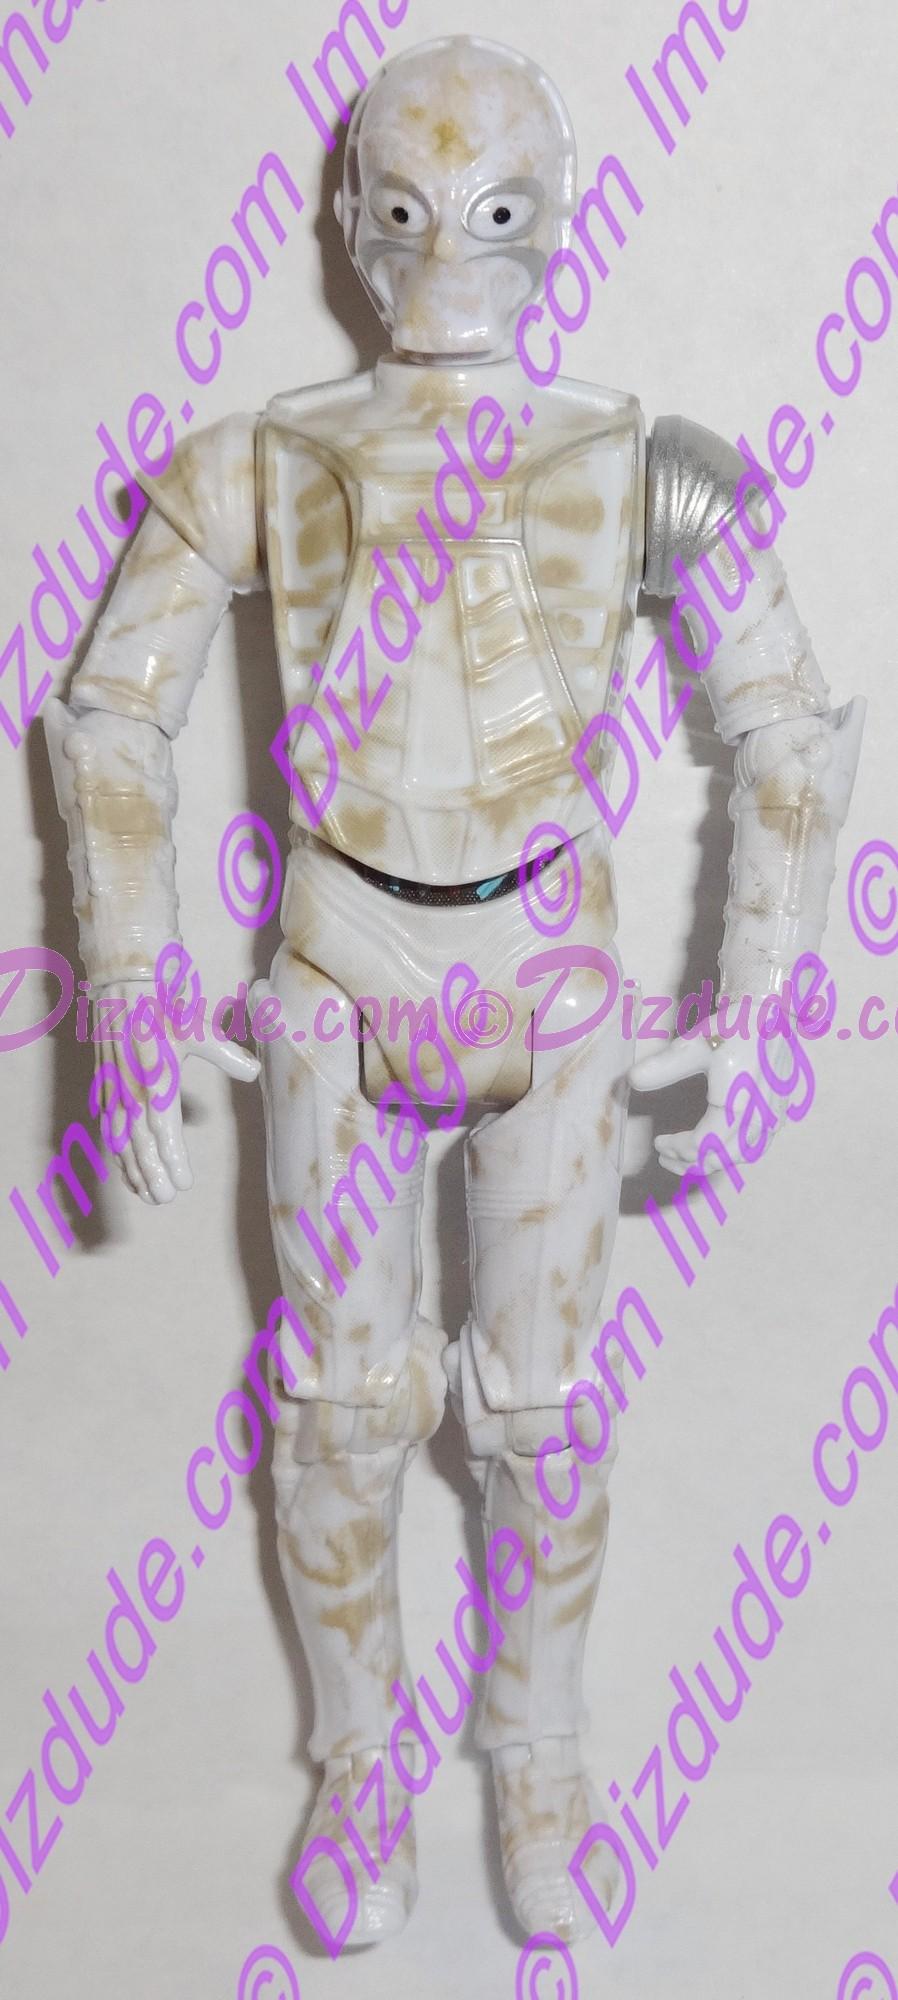 White CZ Protocol Droid from Disney Star Wars Build-A-Droid Factory © Dizdude.com